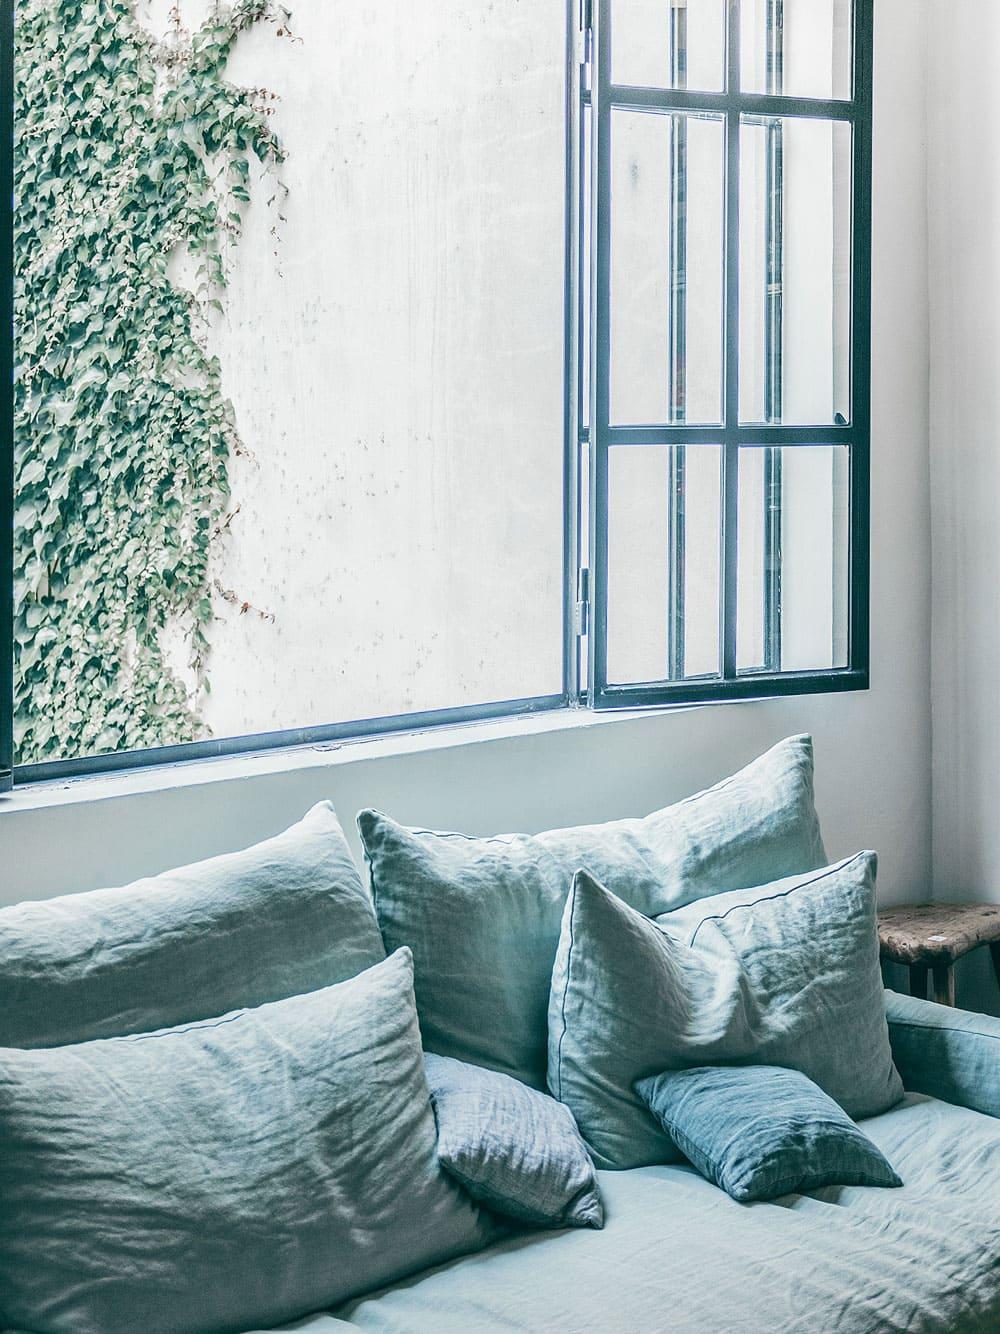 Luxuriöses_Design_exklusive_Farben_Materialien_Sofa_Fenster_Stoff